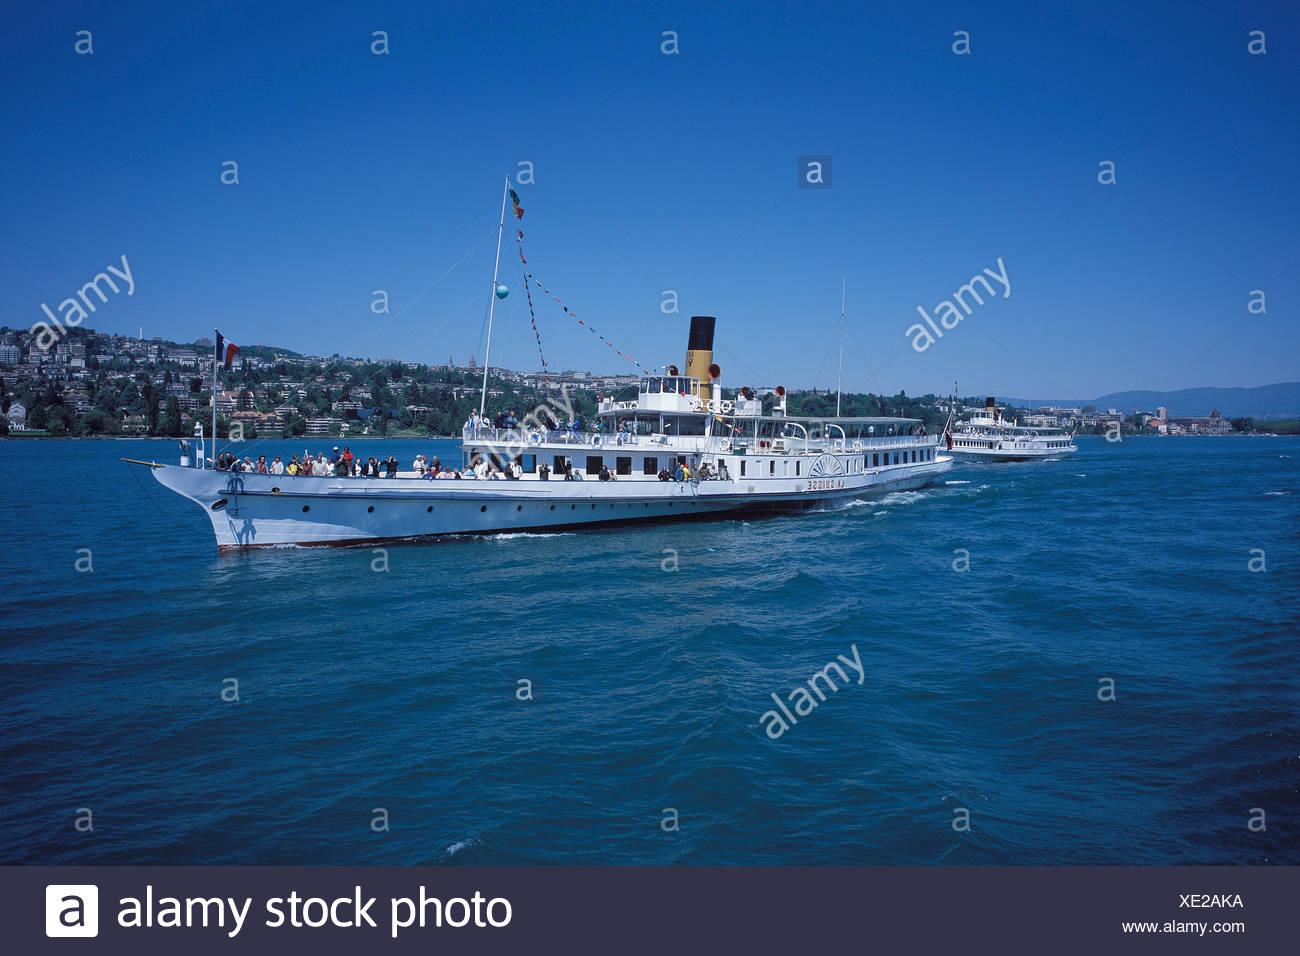 Ships, ship, C.G.N, paddle steamer, steamboat, summer, blue, Lac Léman, lake Geneva, lake, ship, ships, ship, Switzerland, Europ - Stock Image